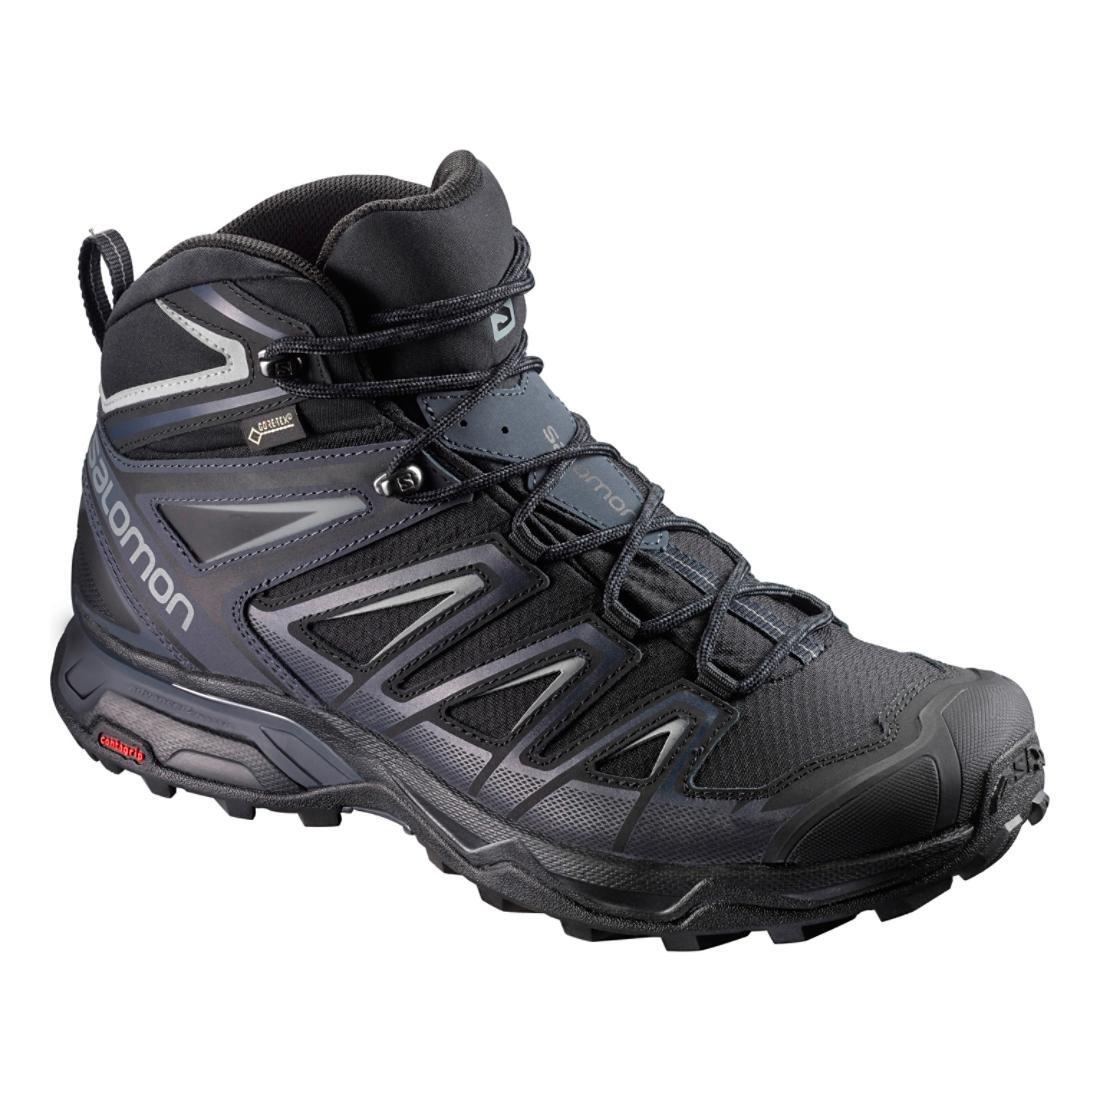 Salomon Men's X Ultra 3 Wide Mid GTX Hiking Boots B079YVZH89 12.5 EE US|Black/India Ink/Monument